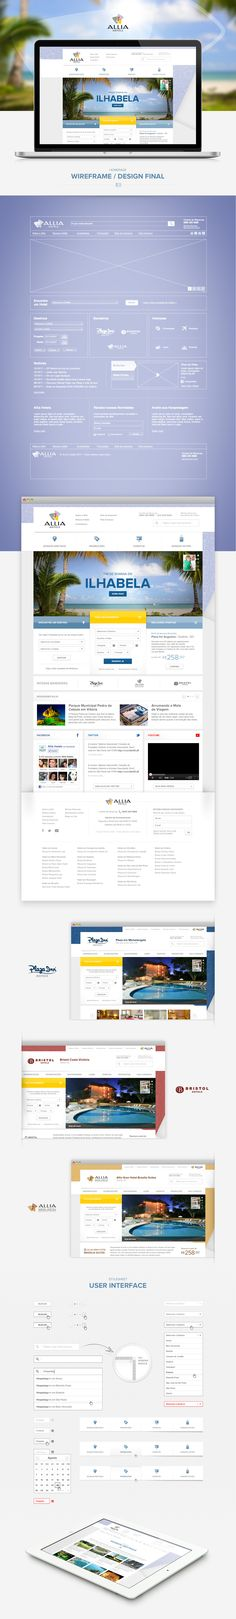 Site Institucional   Allia Hotels   Projetos   OW Interactive